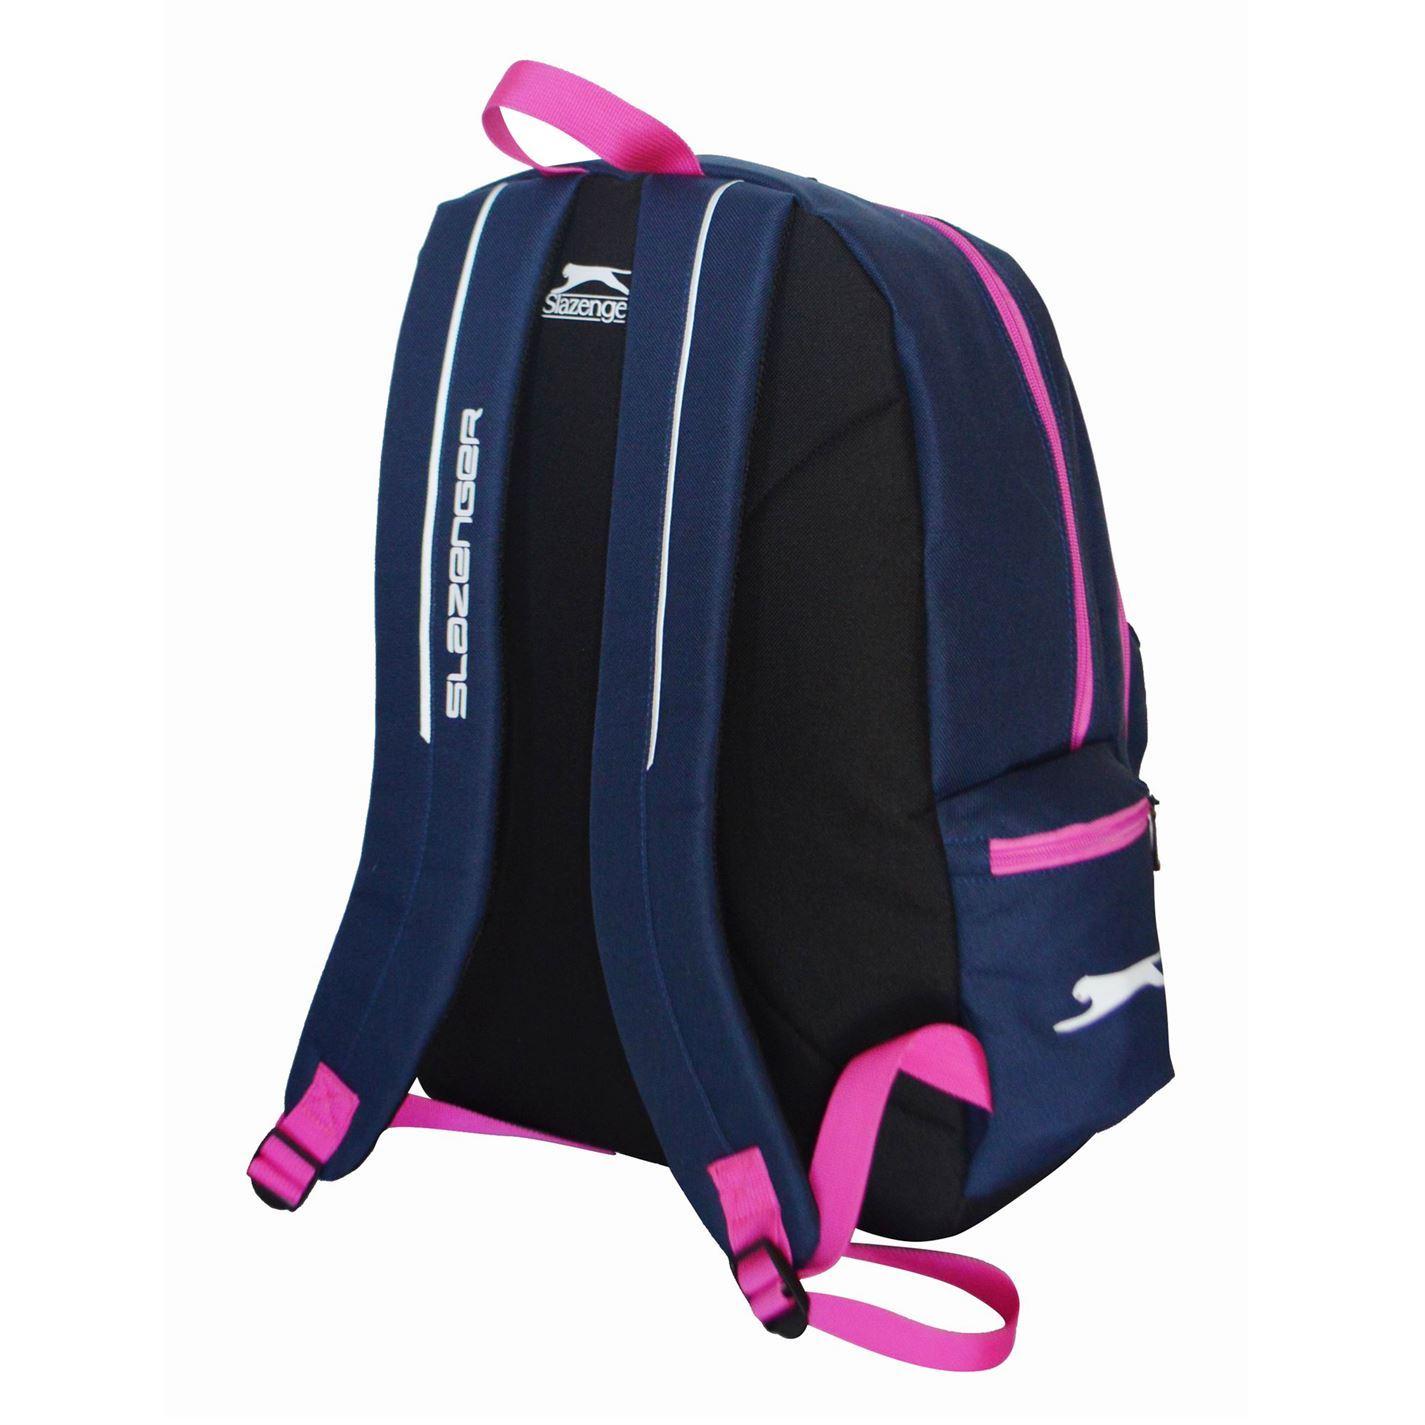 Slazenger Backpack Lunch Box Navy Pink Rucksack Sports Bag Gymbag Kitbag